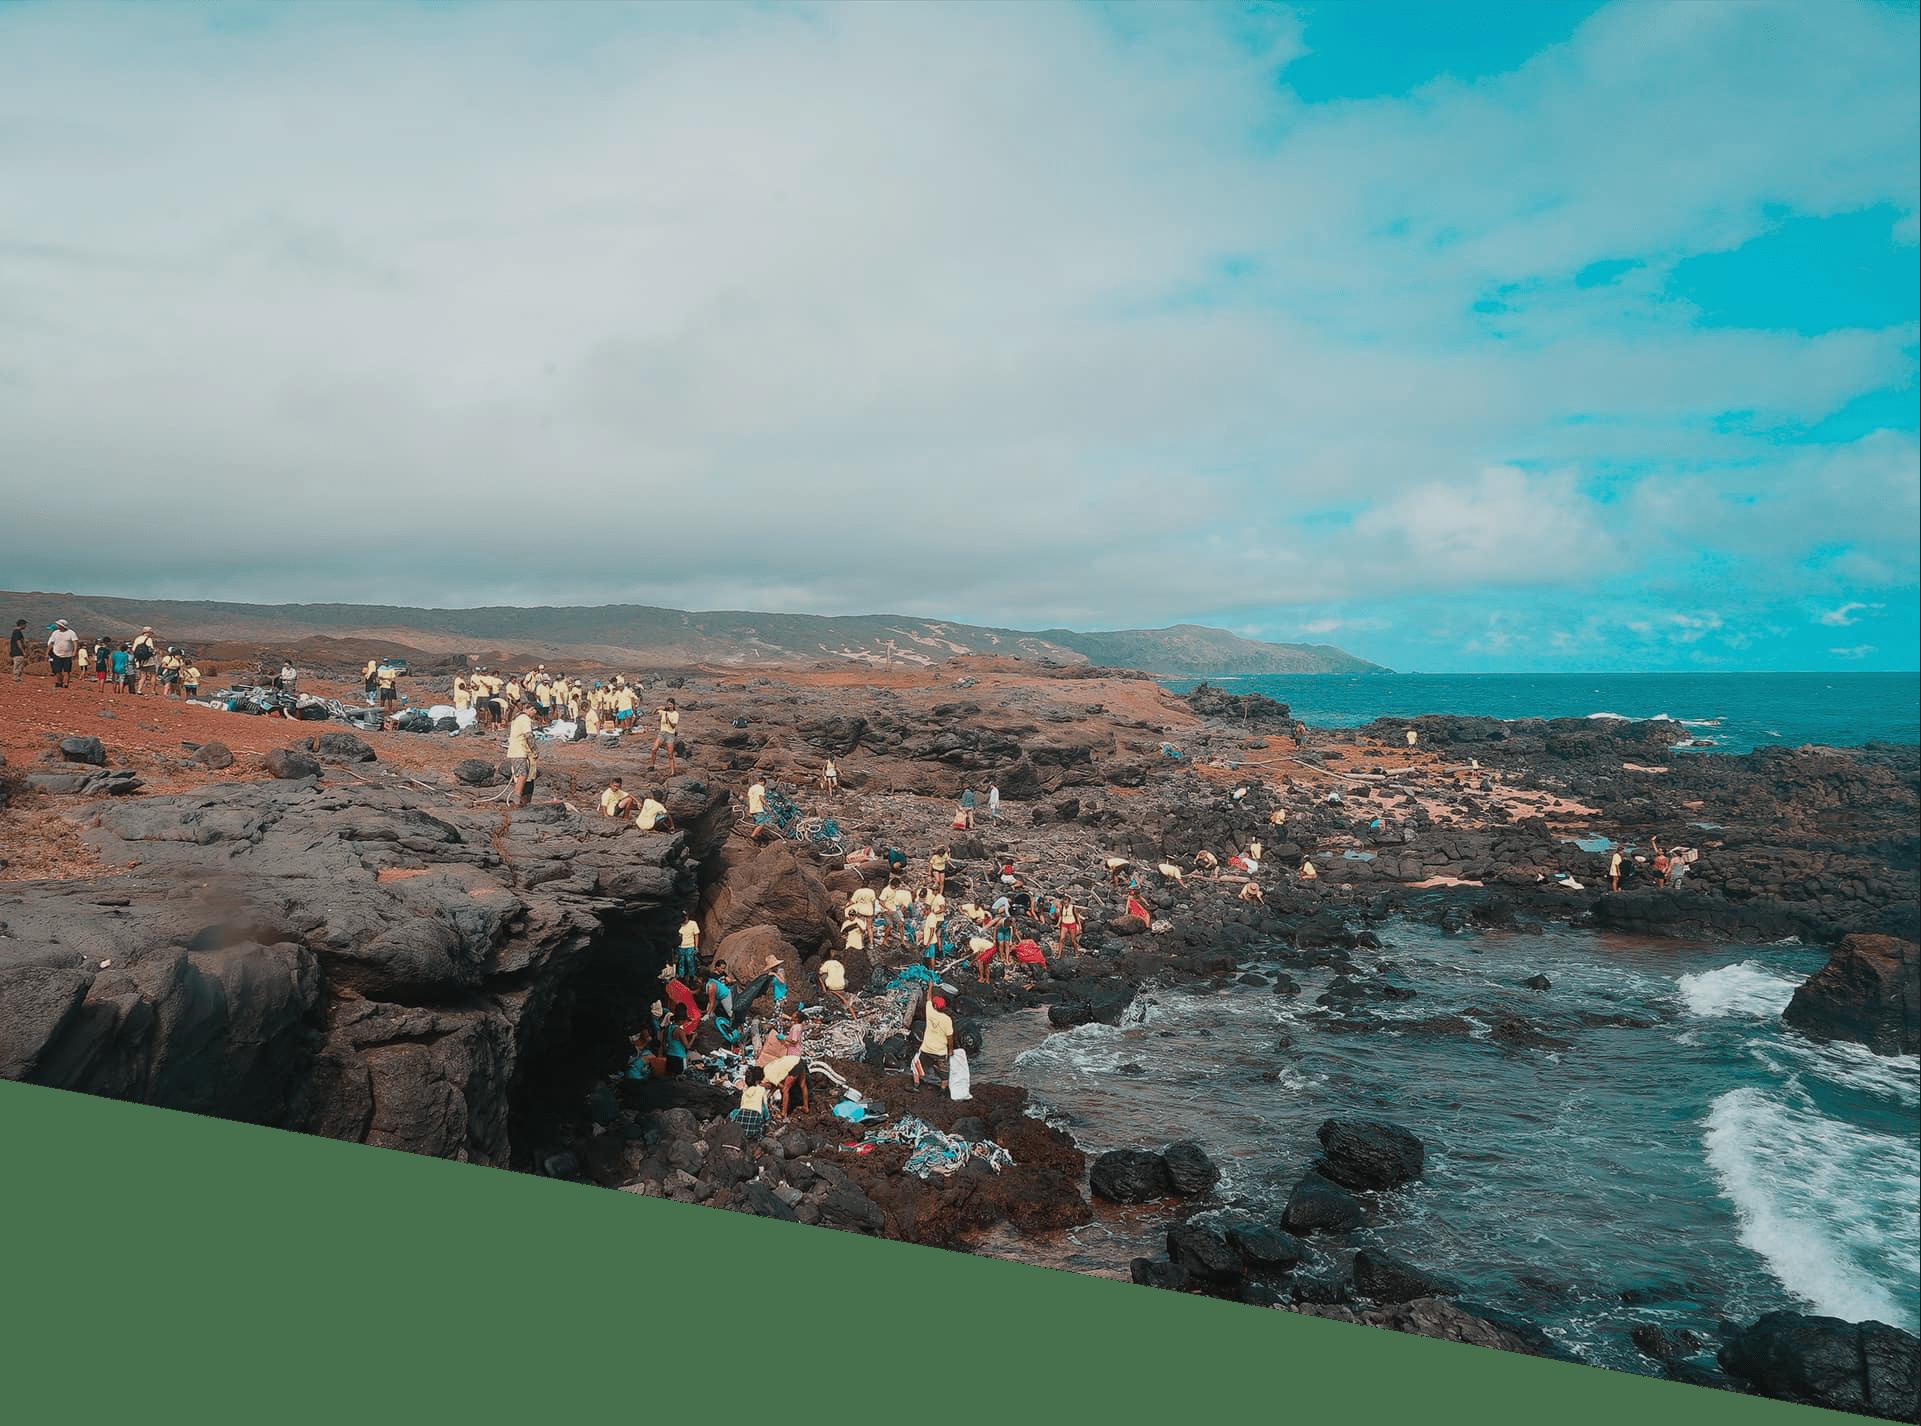 Sustainable Coastlines Hawaii shoreline cleanup